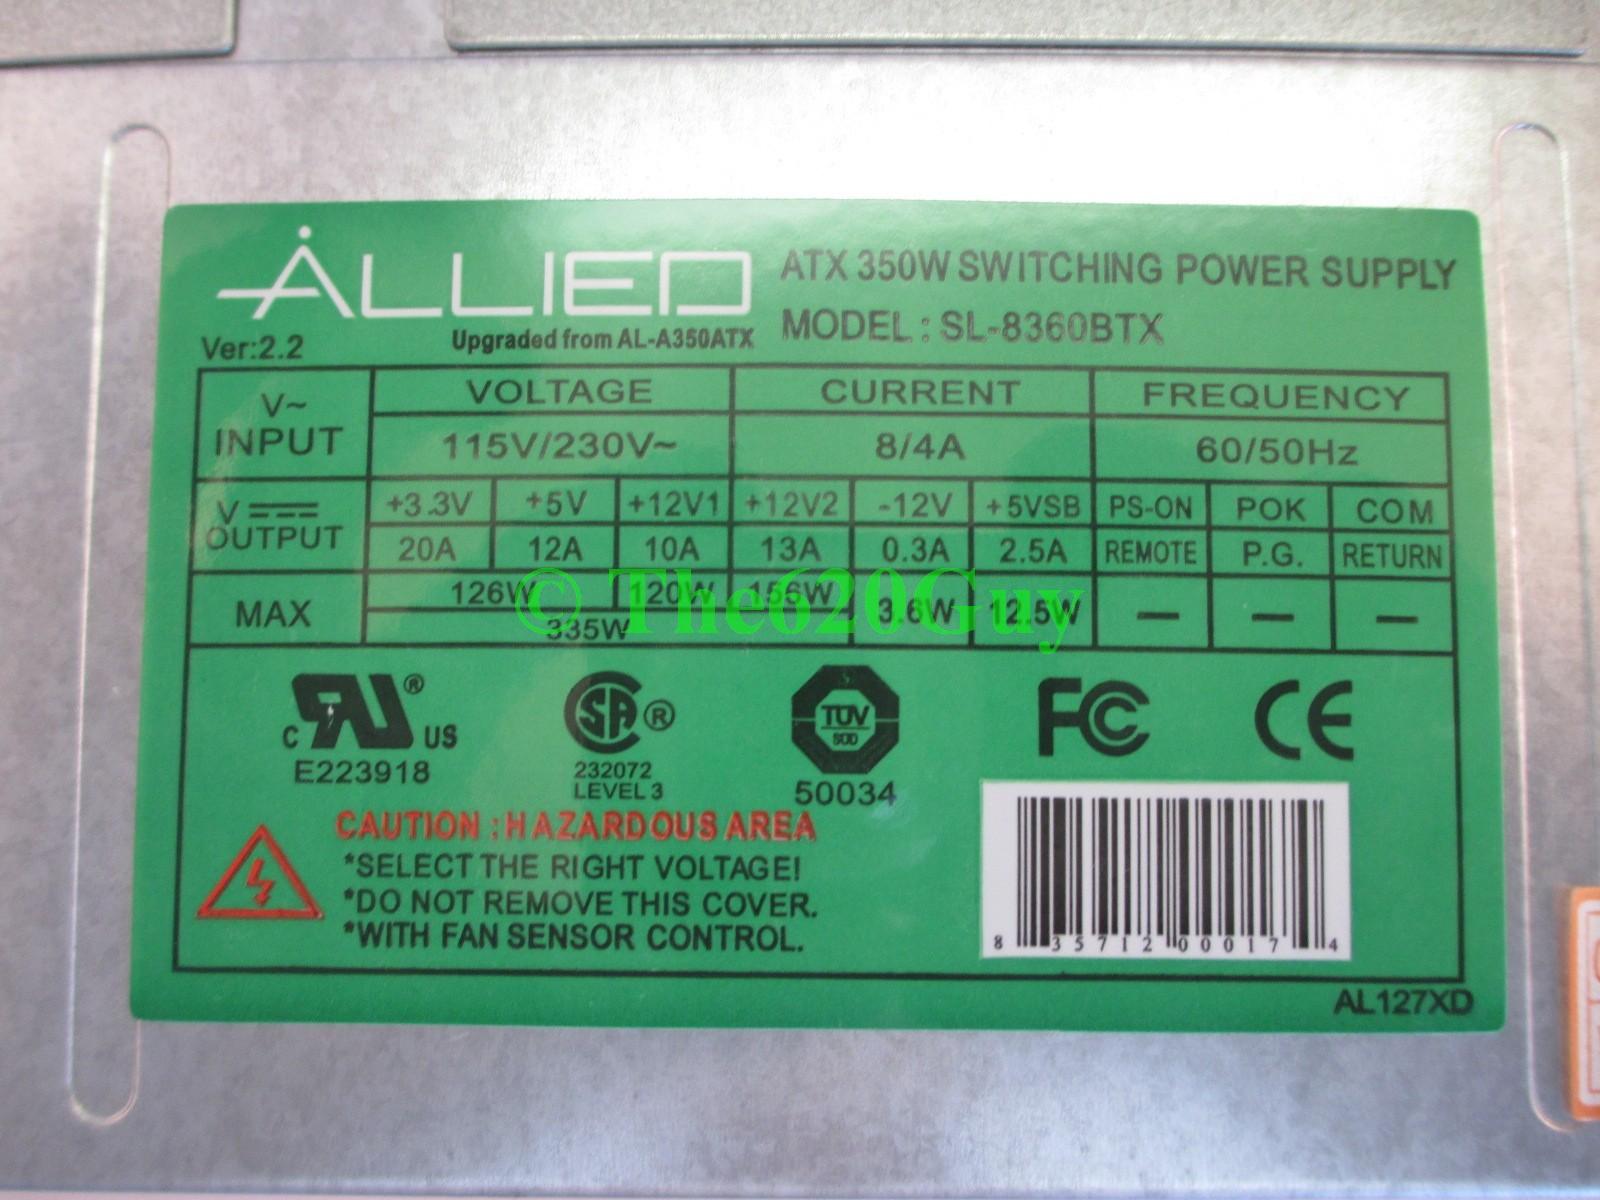 Allied Sl 8360btx 350w 350 Watt Atx12v Switching Power Supply 20 4 2